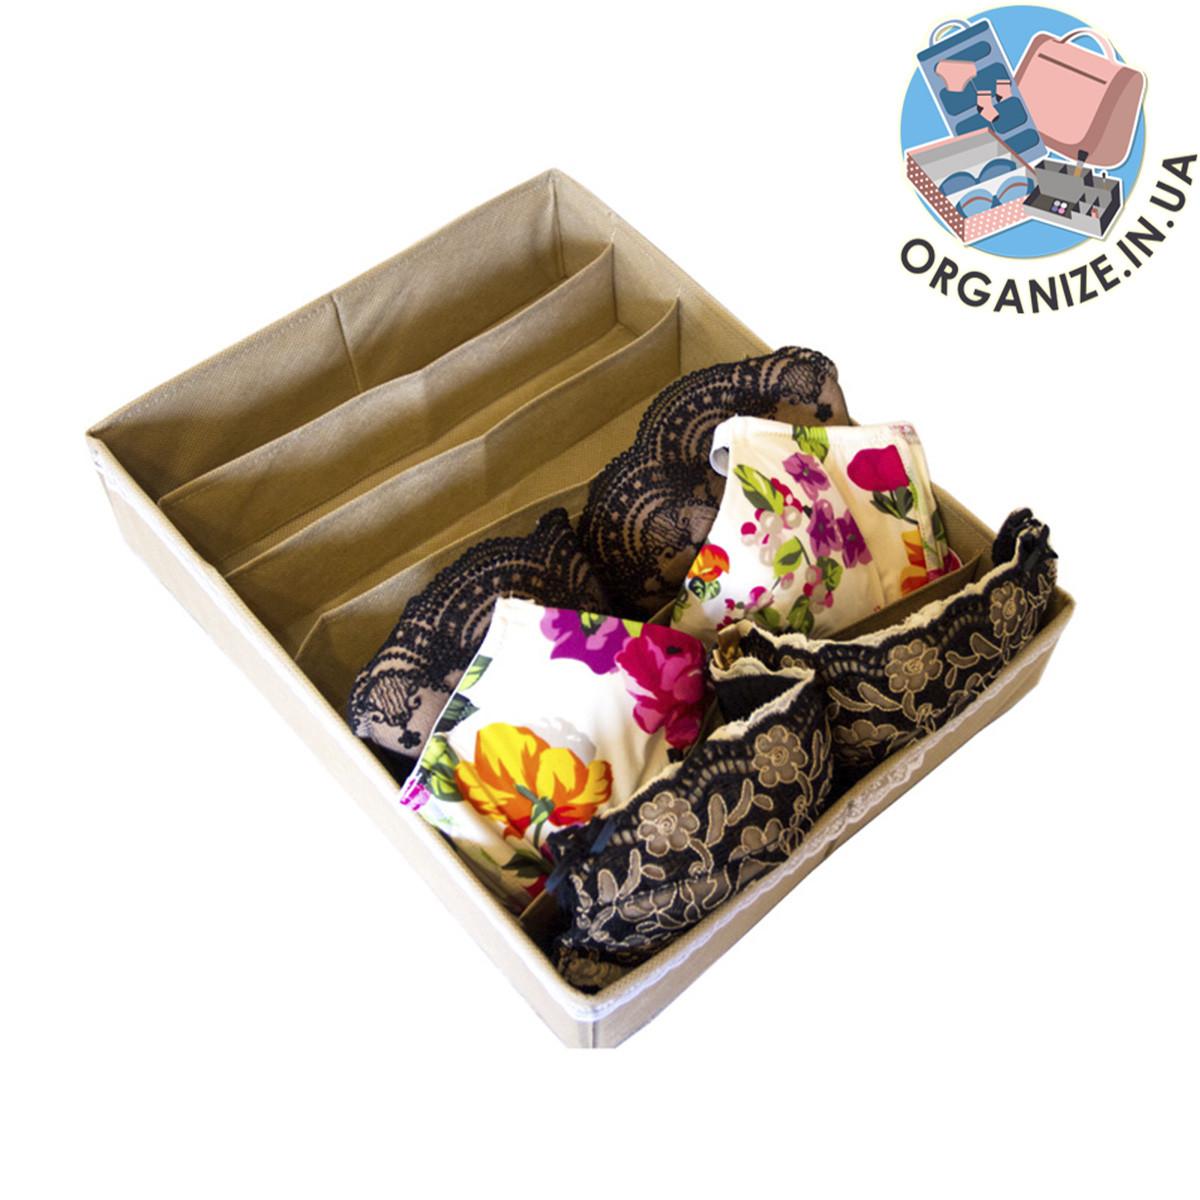 Коробка для бюстиков ORGANIZE (бежевый)